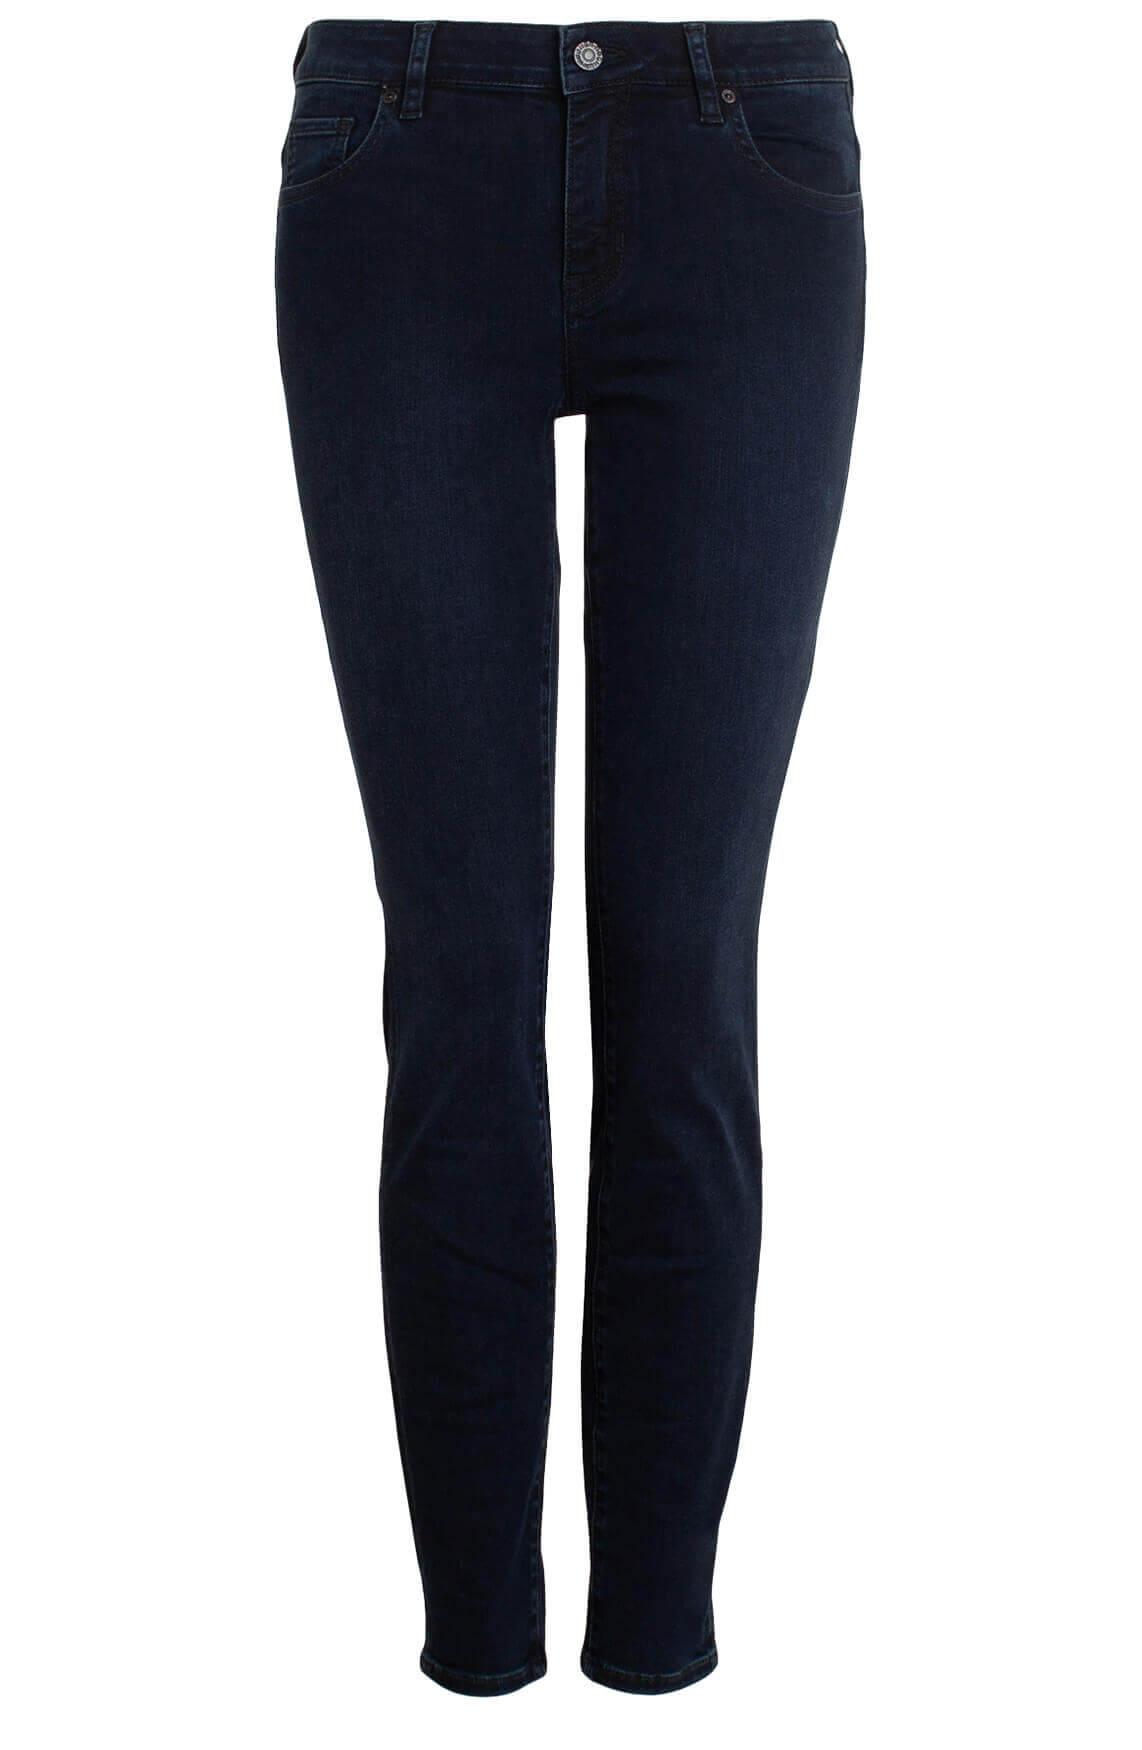 Rosner Dames Antonia jeans Blauw